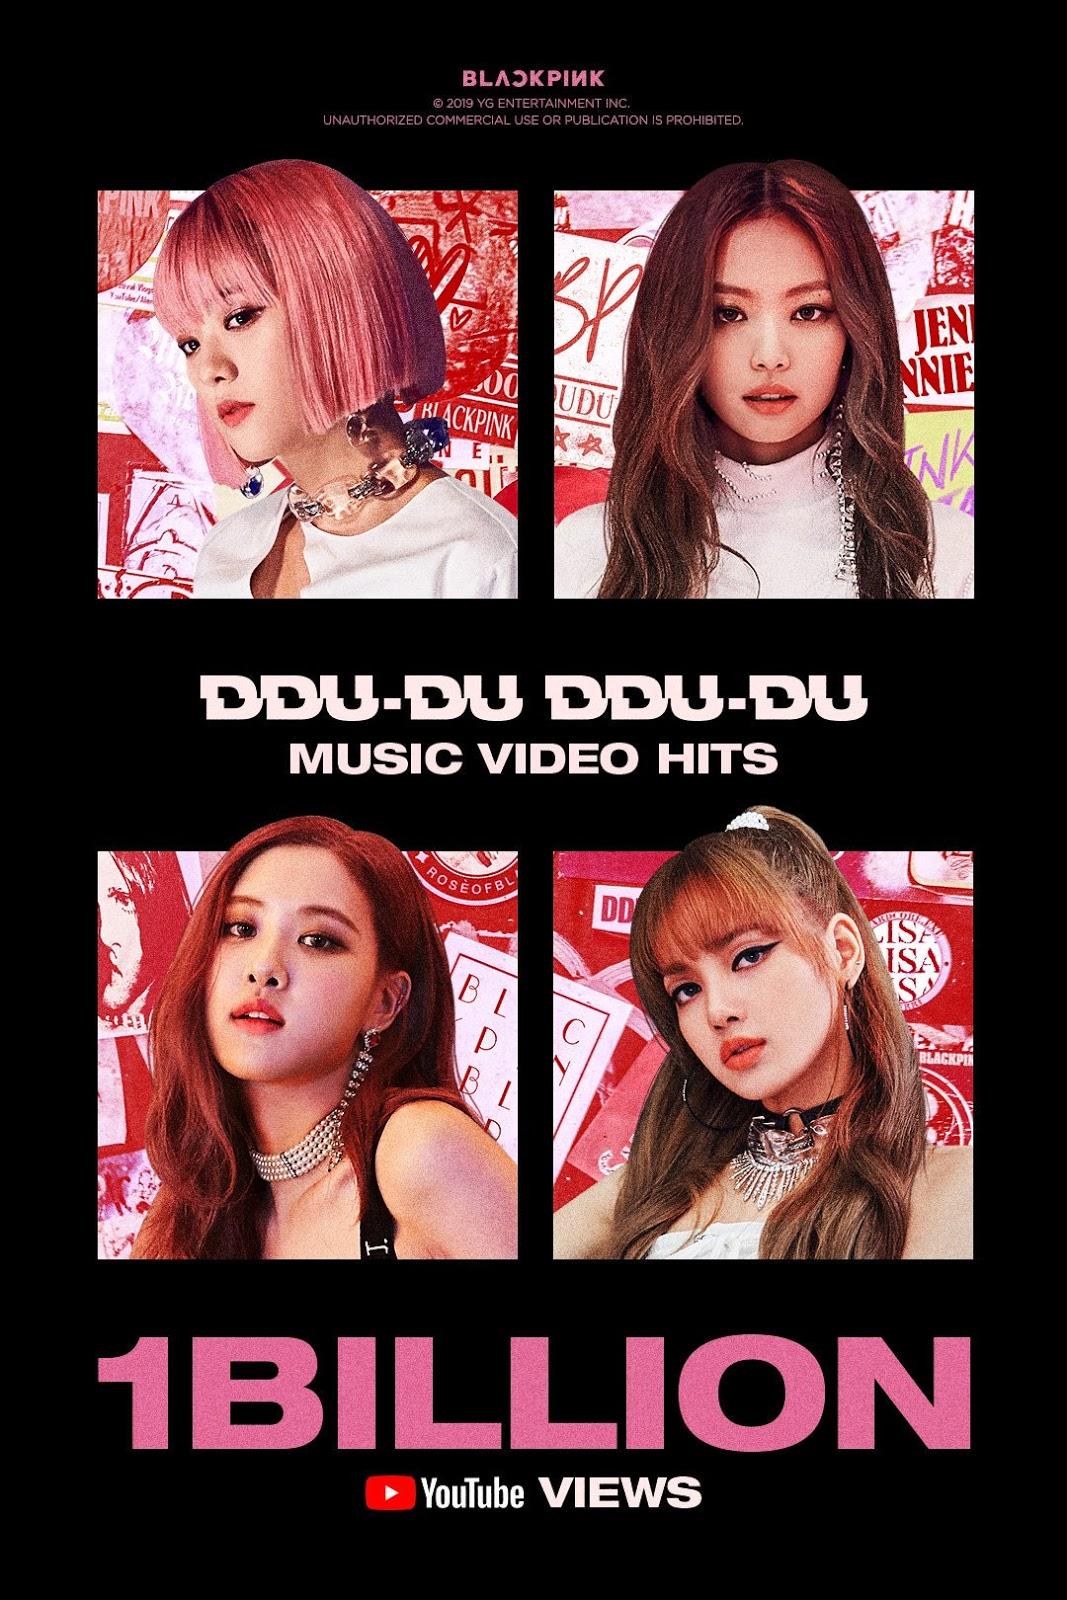 BLACKPINK's 'DDU-DU DDU-DU' Becomes First K-Pop Group MV to Touch 1 Billion Views on Youtube